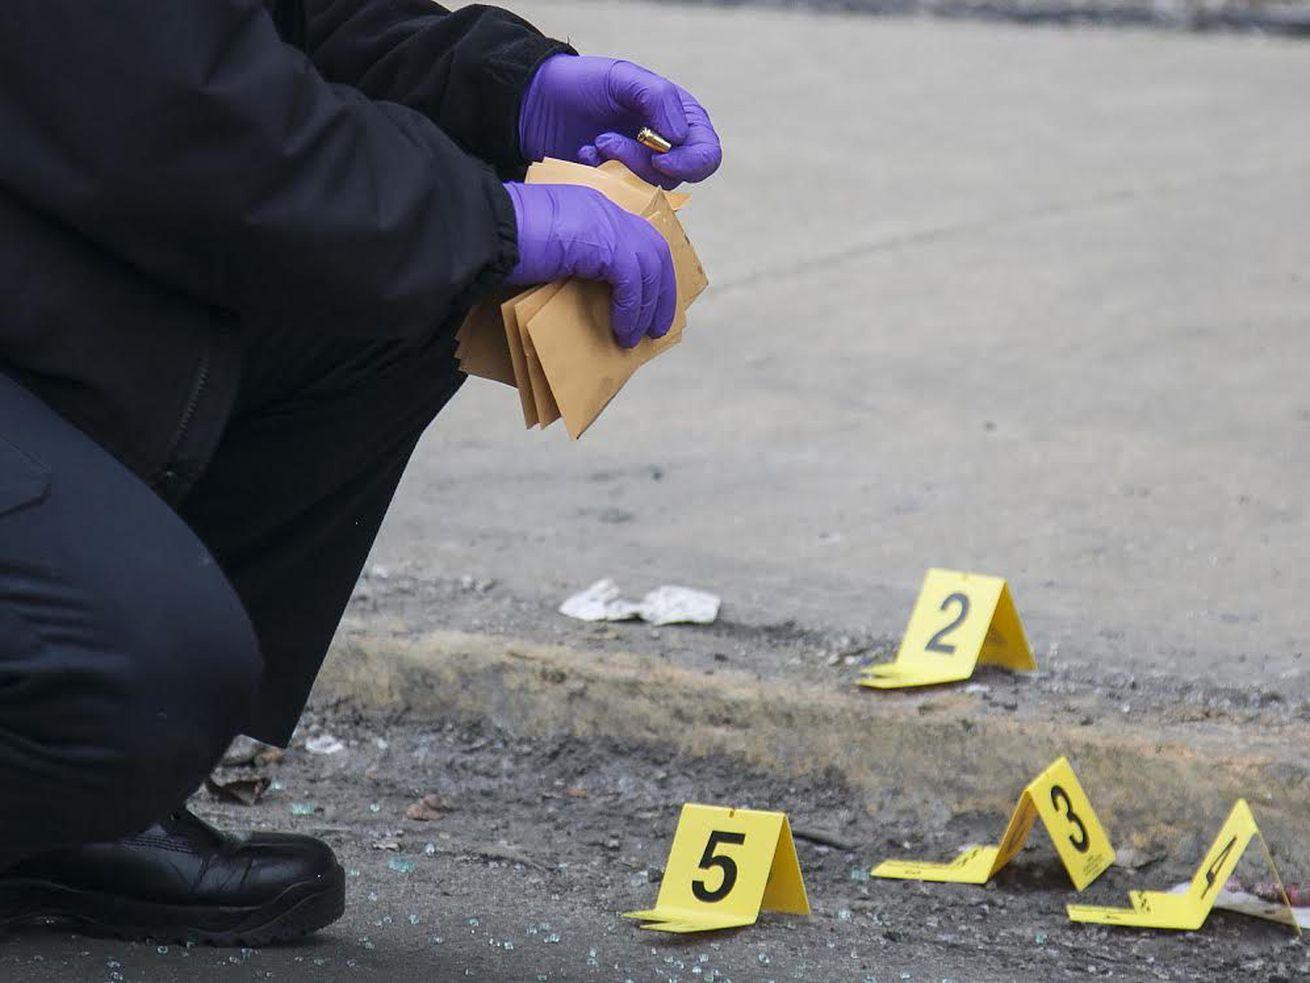 A boy was shot in Humboldt Park